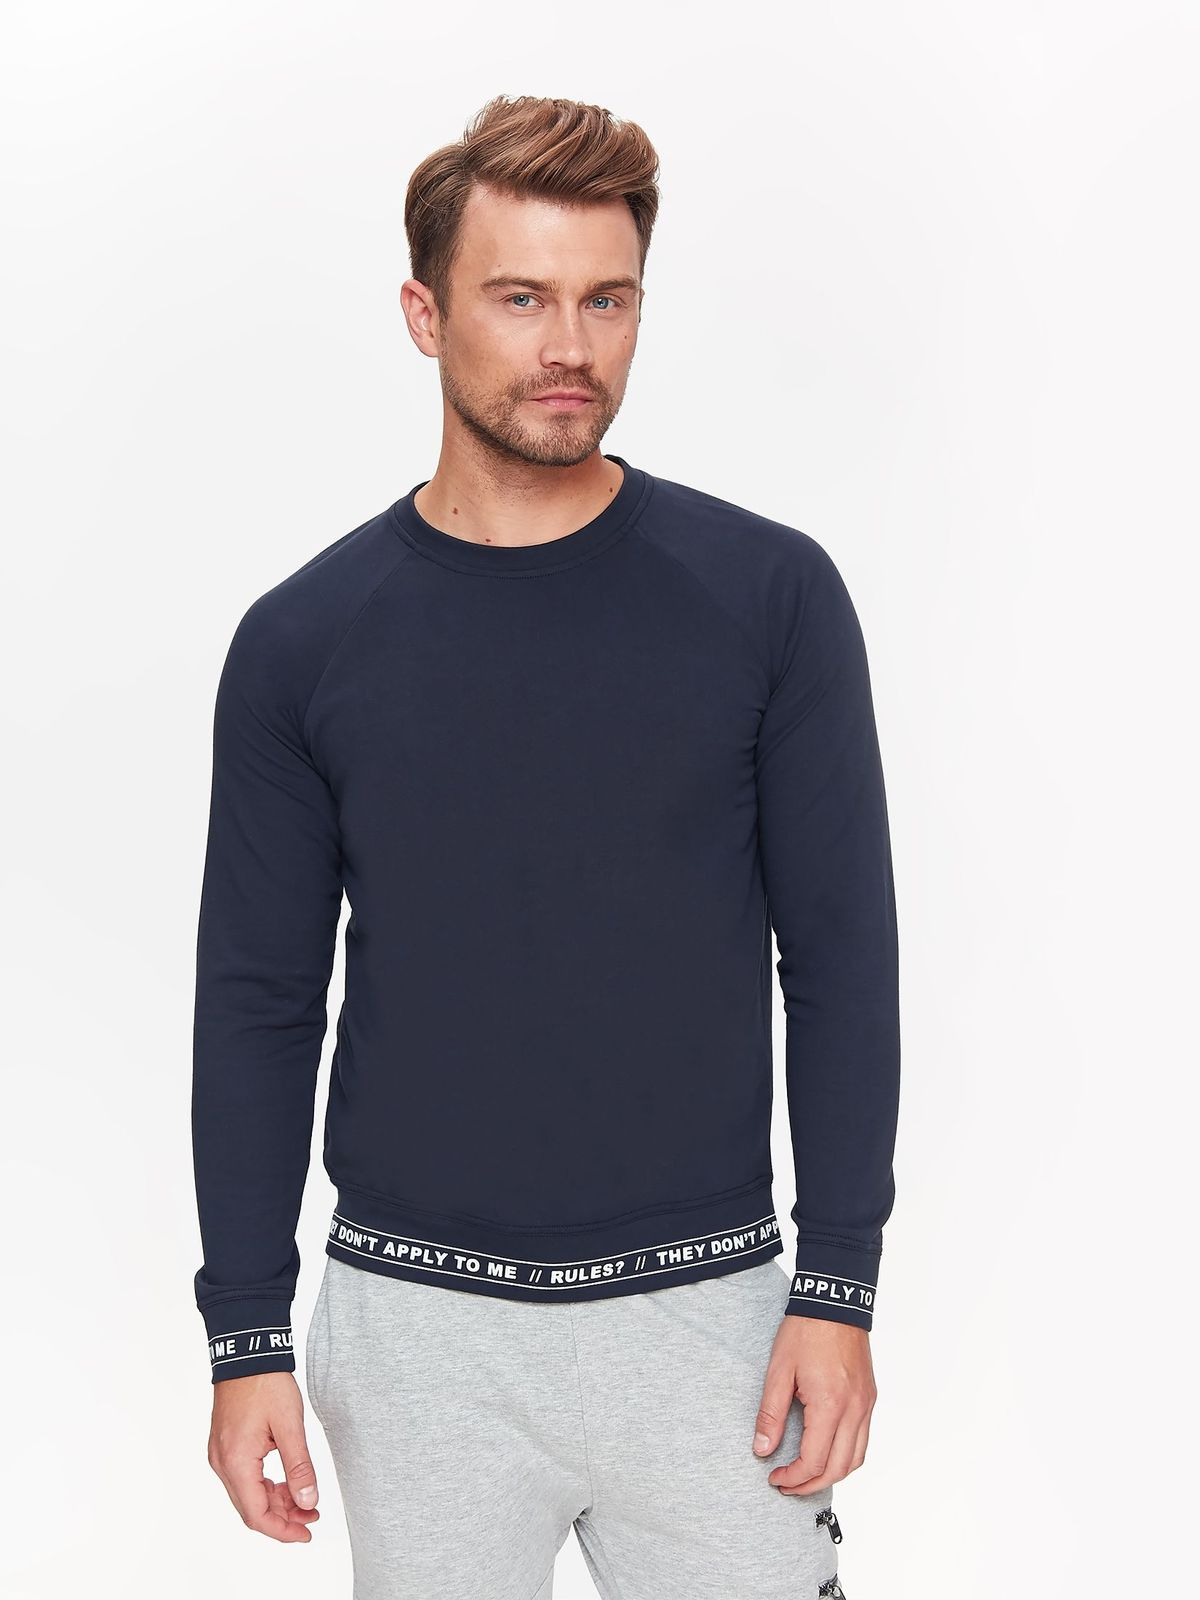 TOP SECRET top secret ανδρικη φουτερ μπλουζα